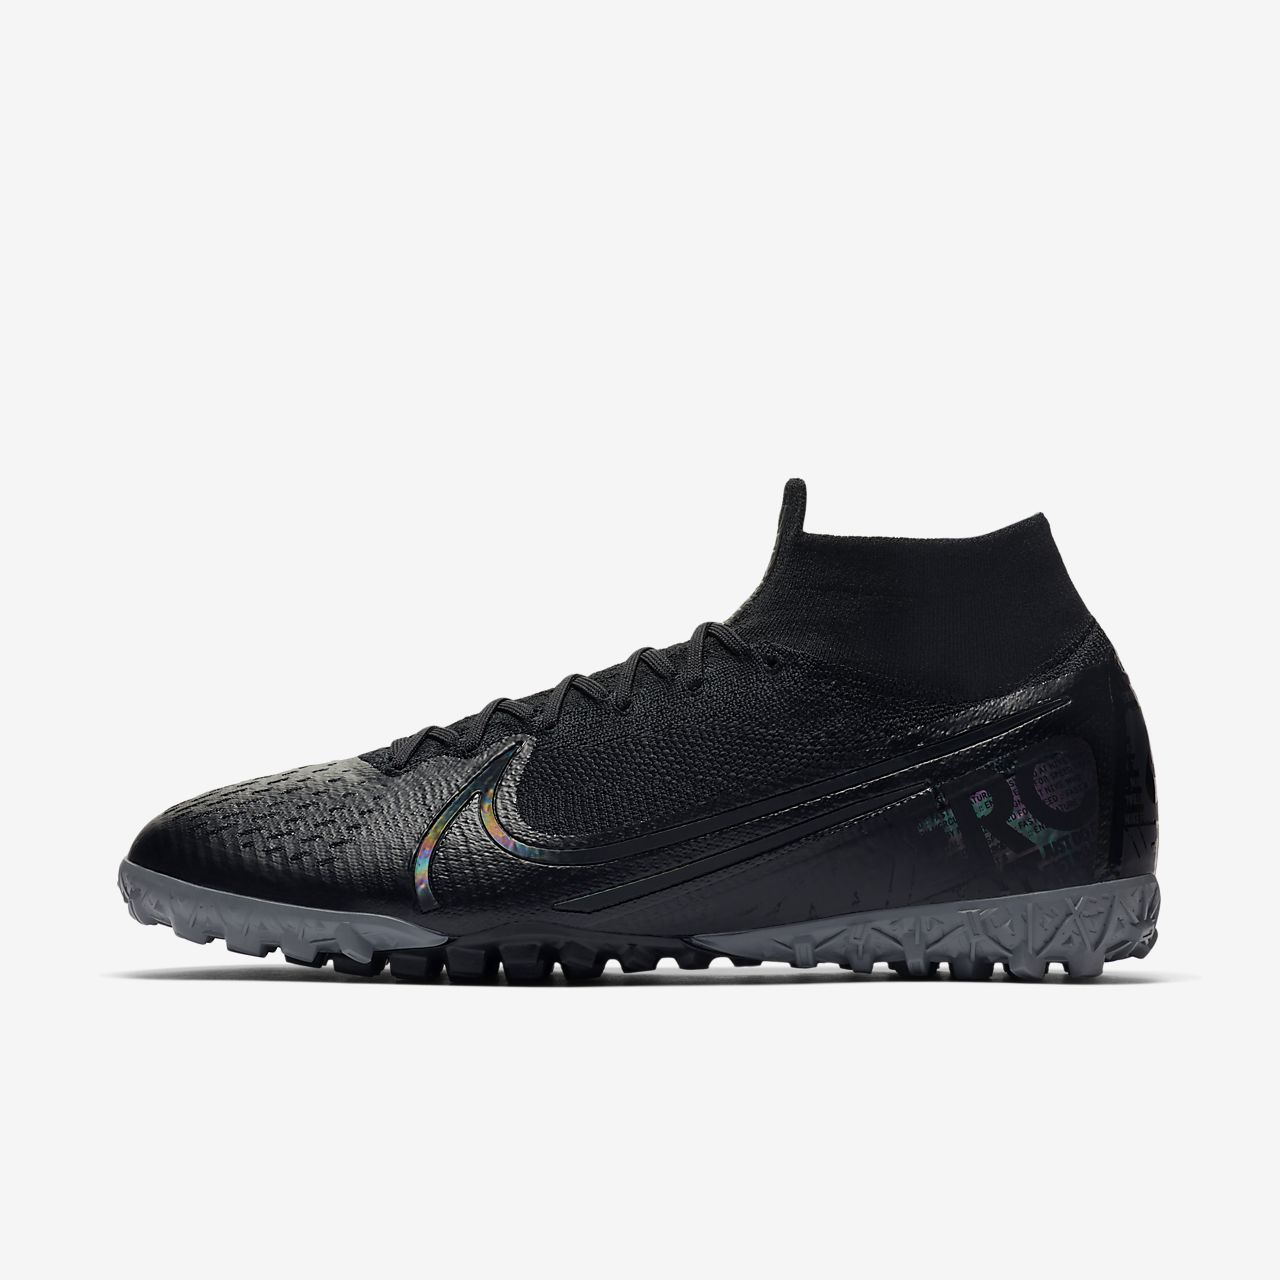 Nike Mercurial Superfly 7 Elite TF Artificial-Turf Football Shoe